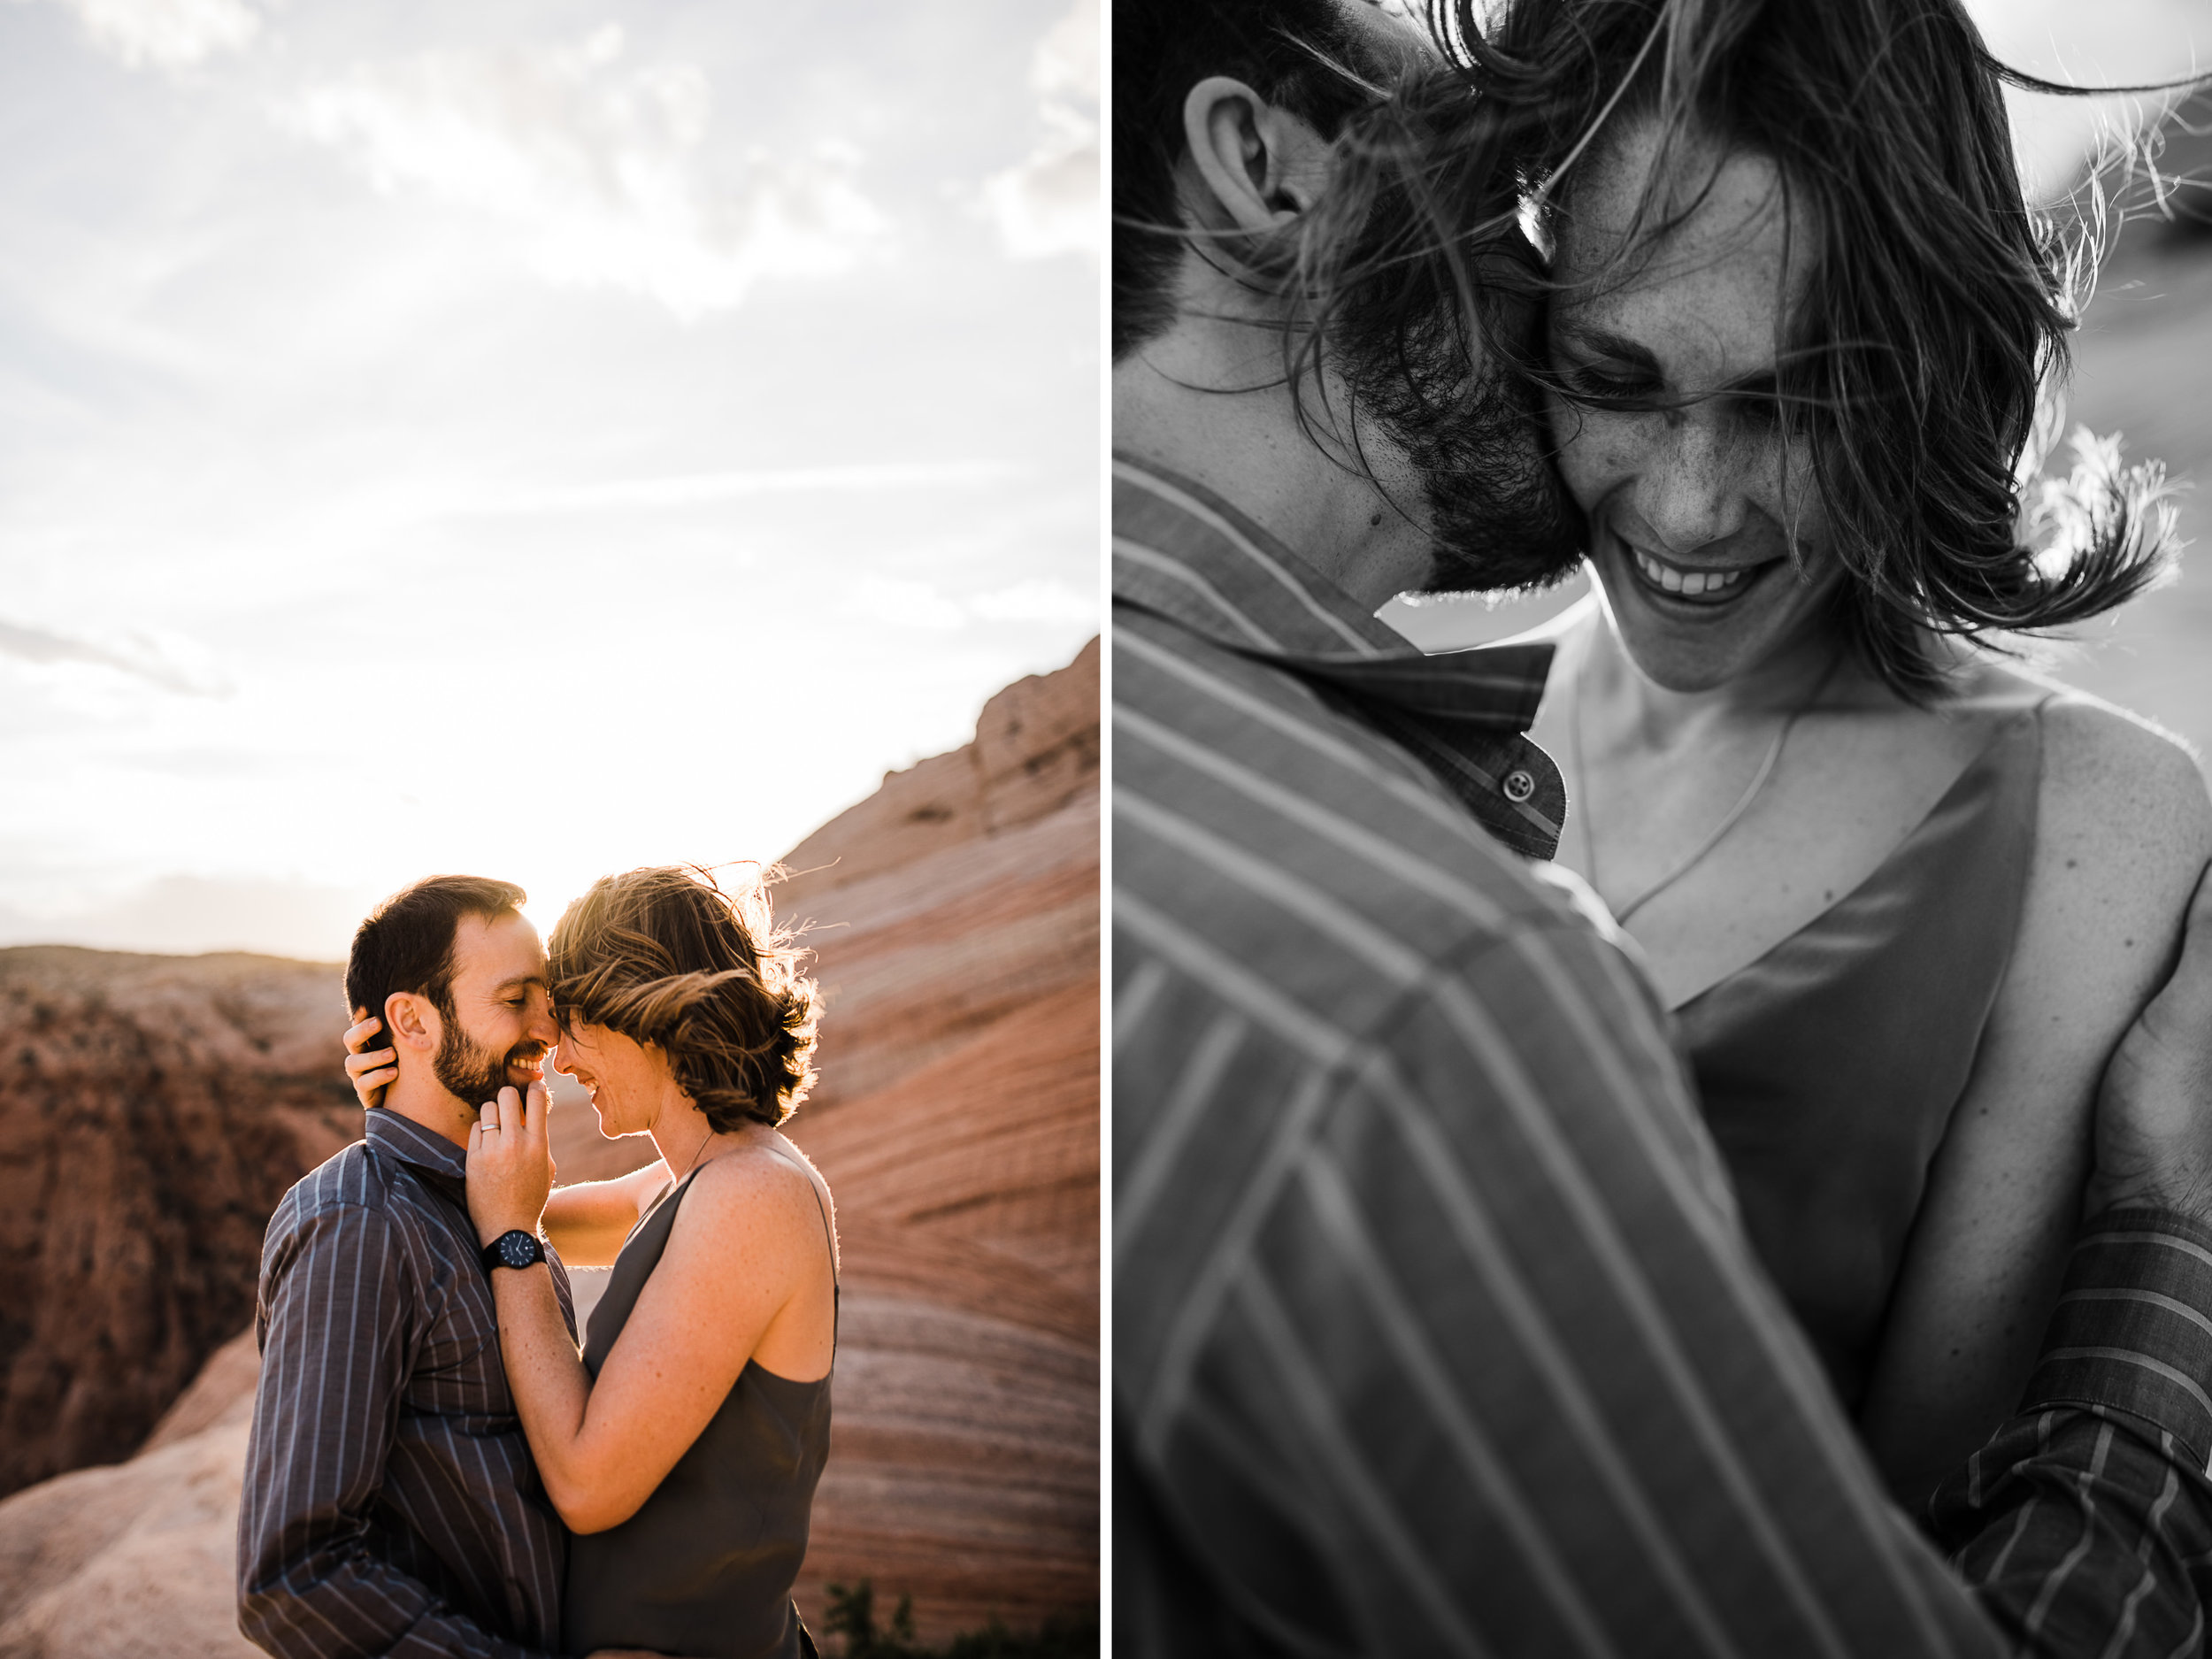 utah desert adventure engagement session | destination engagement photo inspiration | utah adventure elopement photographers | the hearnes adventure photography | www.thehearnes.com